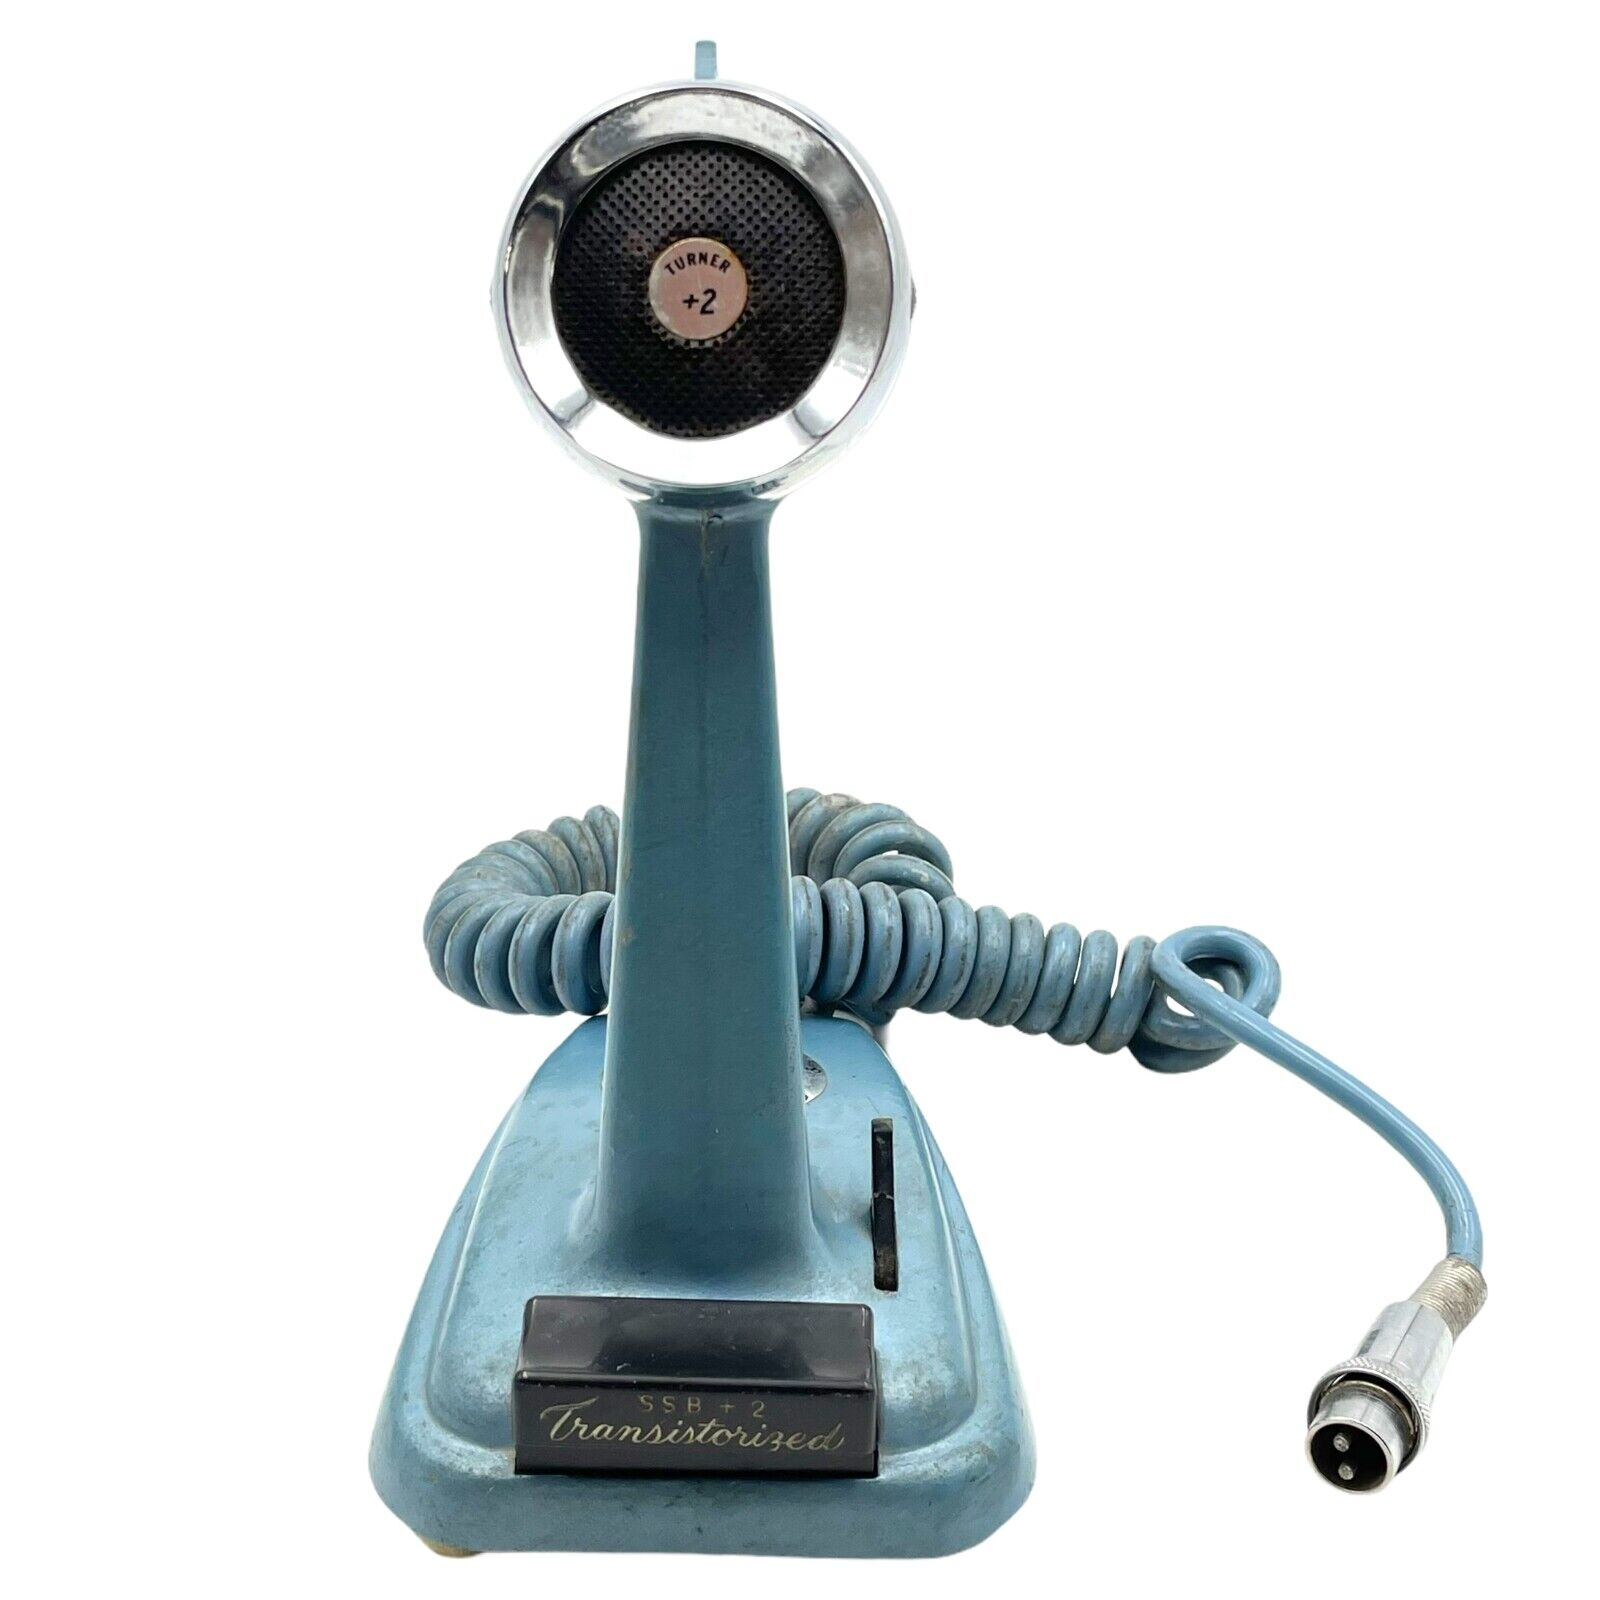 Vintage Turner +2 SSB Transistorized Blue Microphone Ham Radio Untested. Buy it now for 125.00